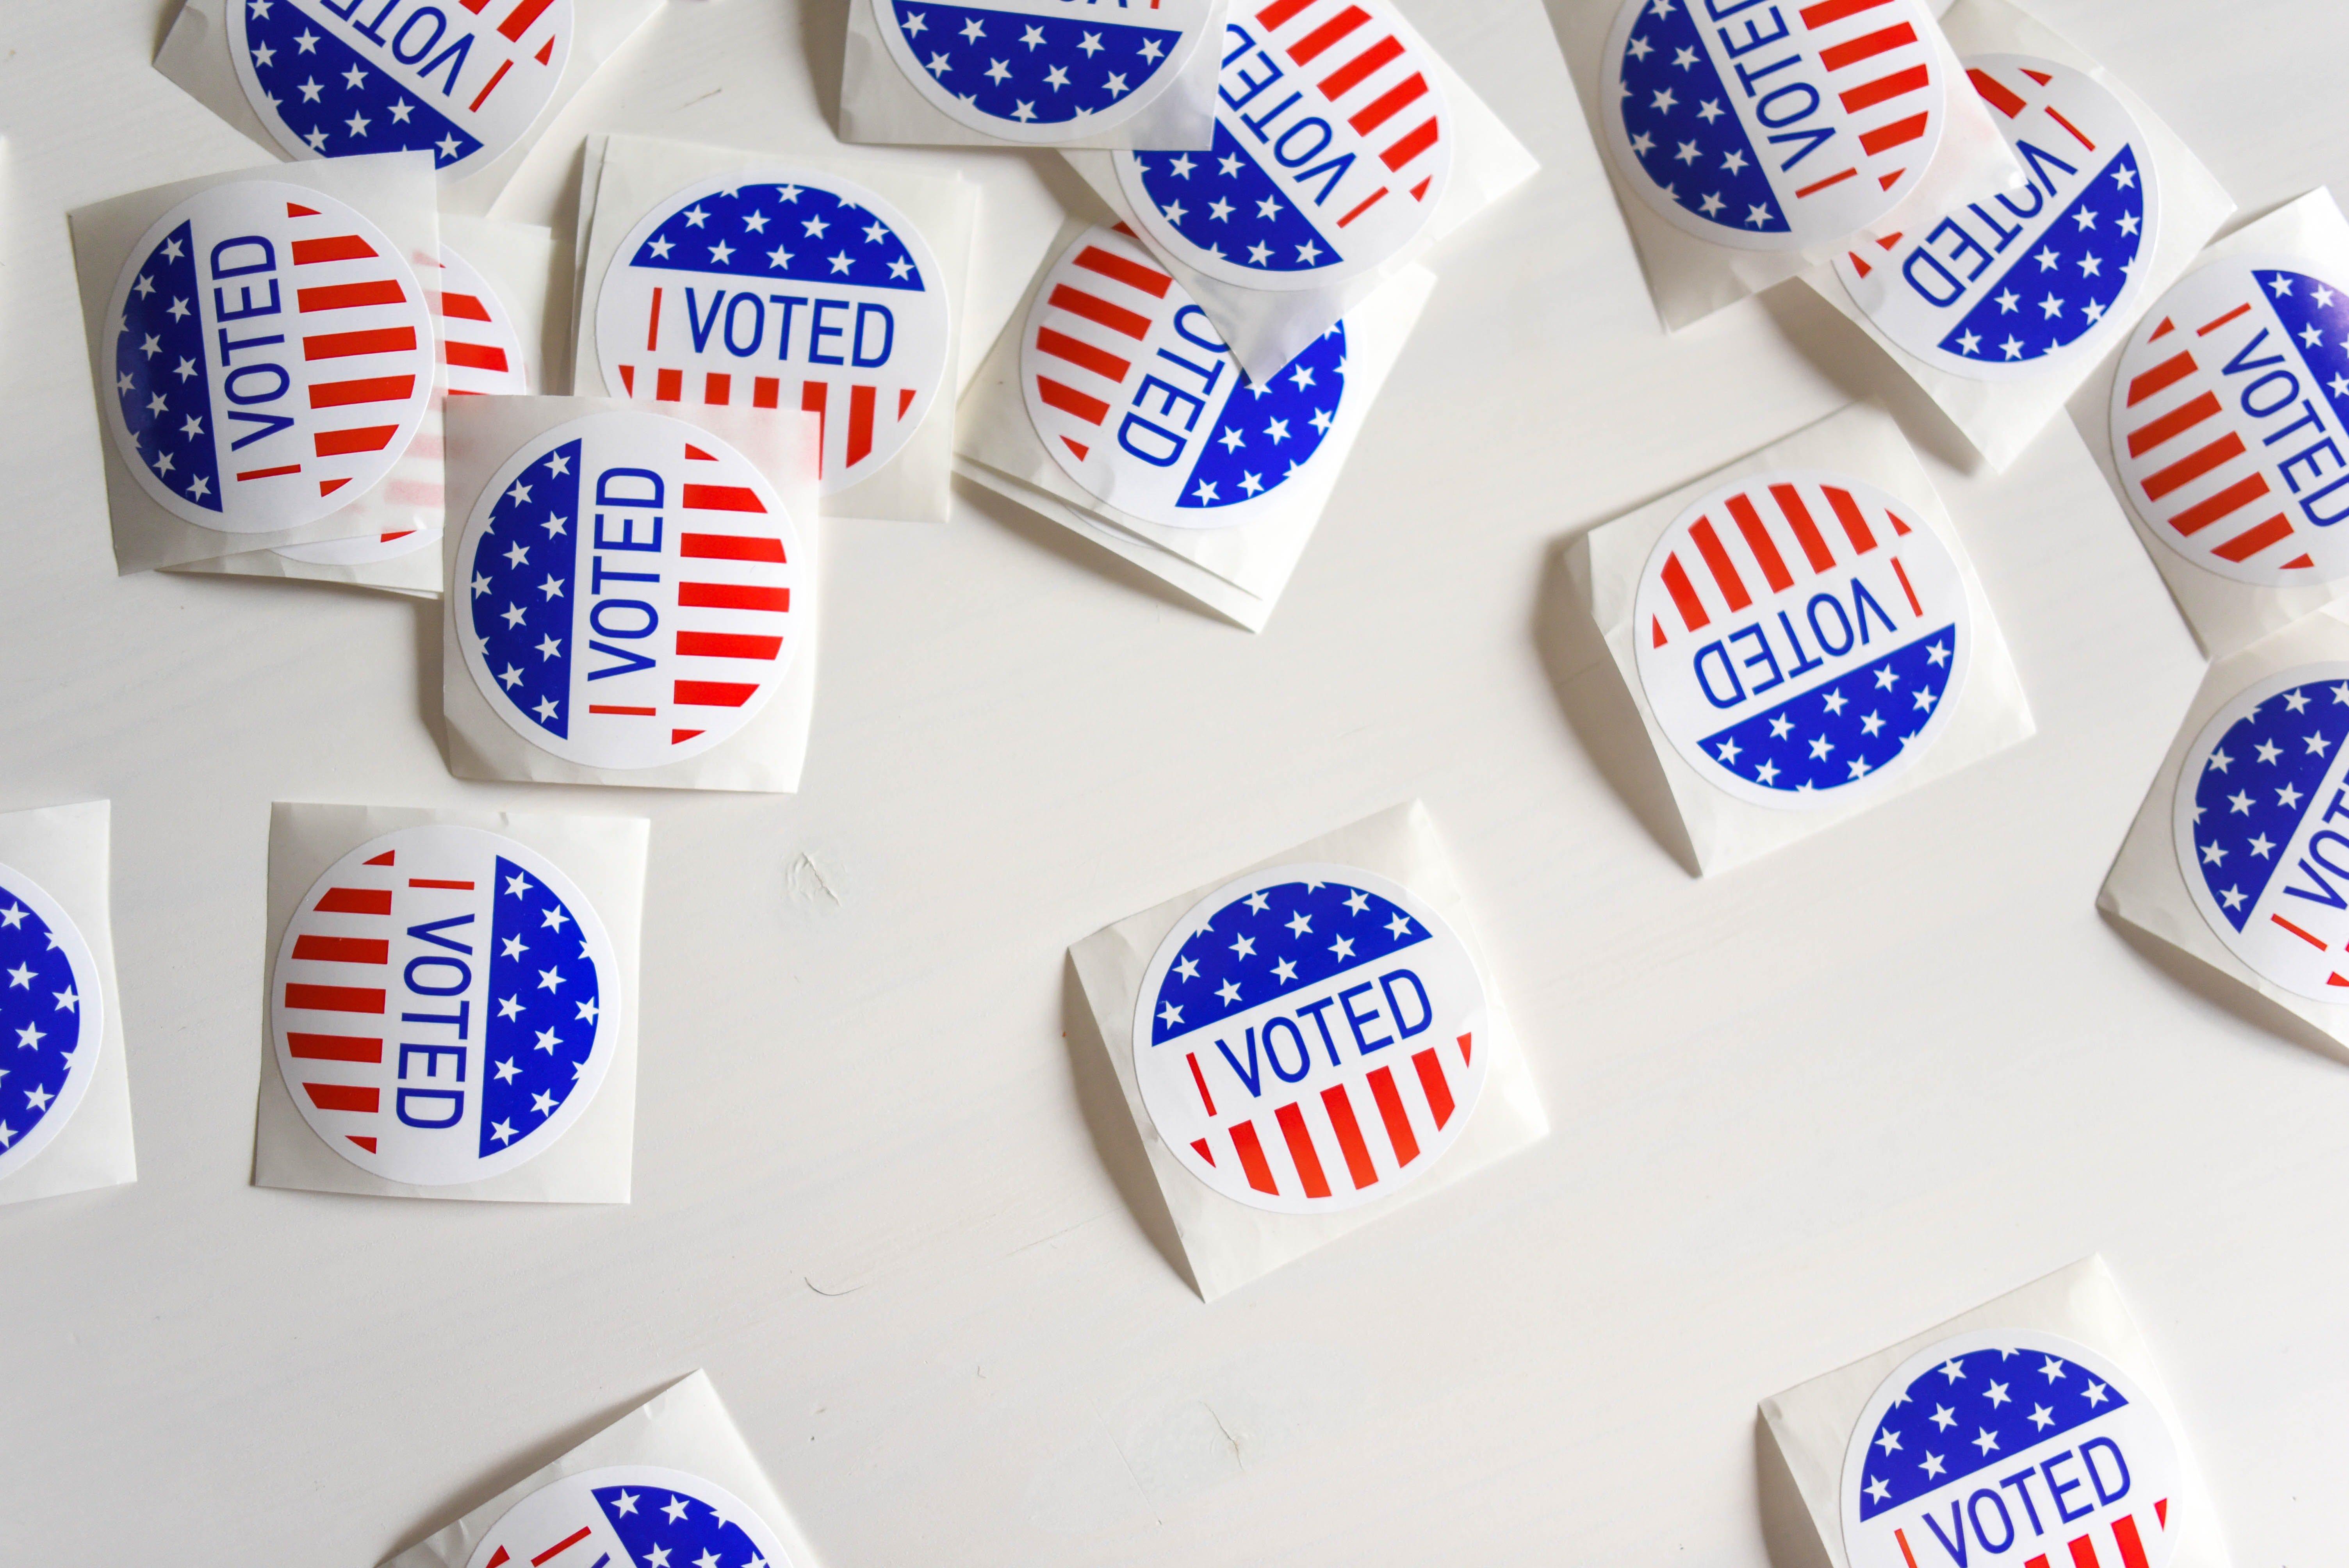 Voting-stickers-United-States.jpg